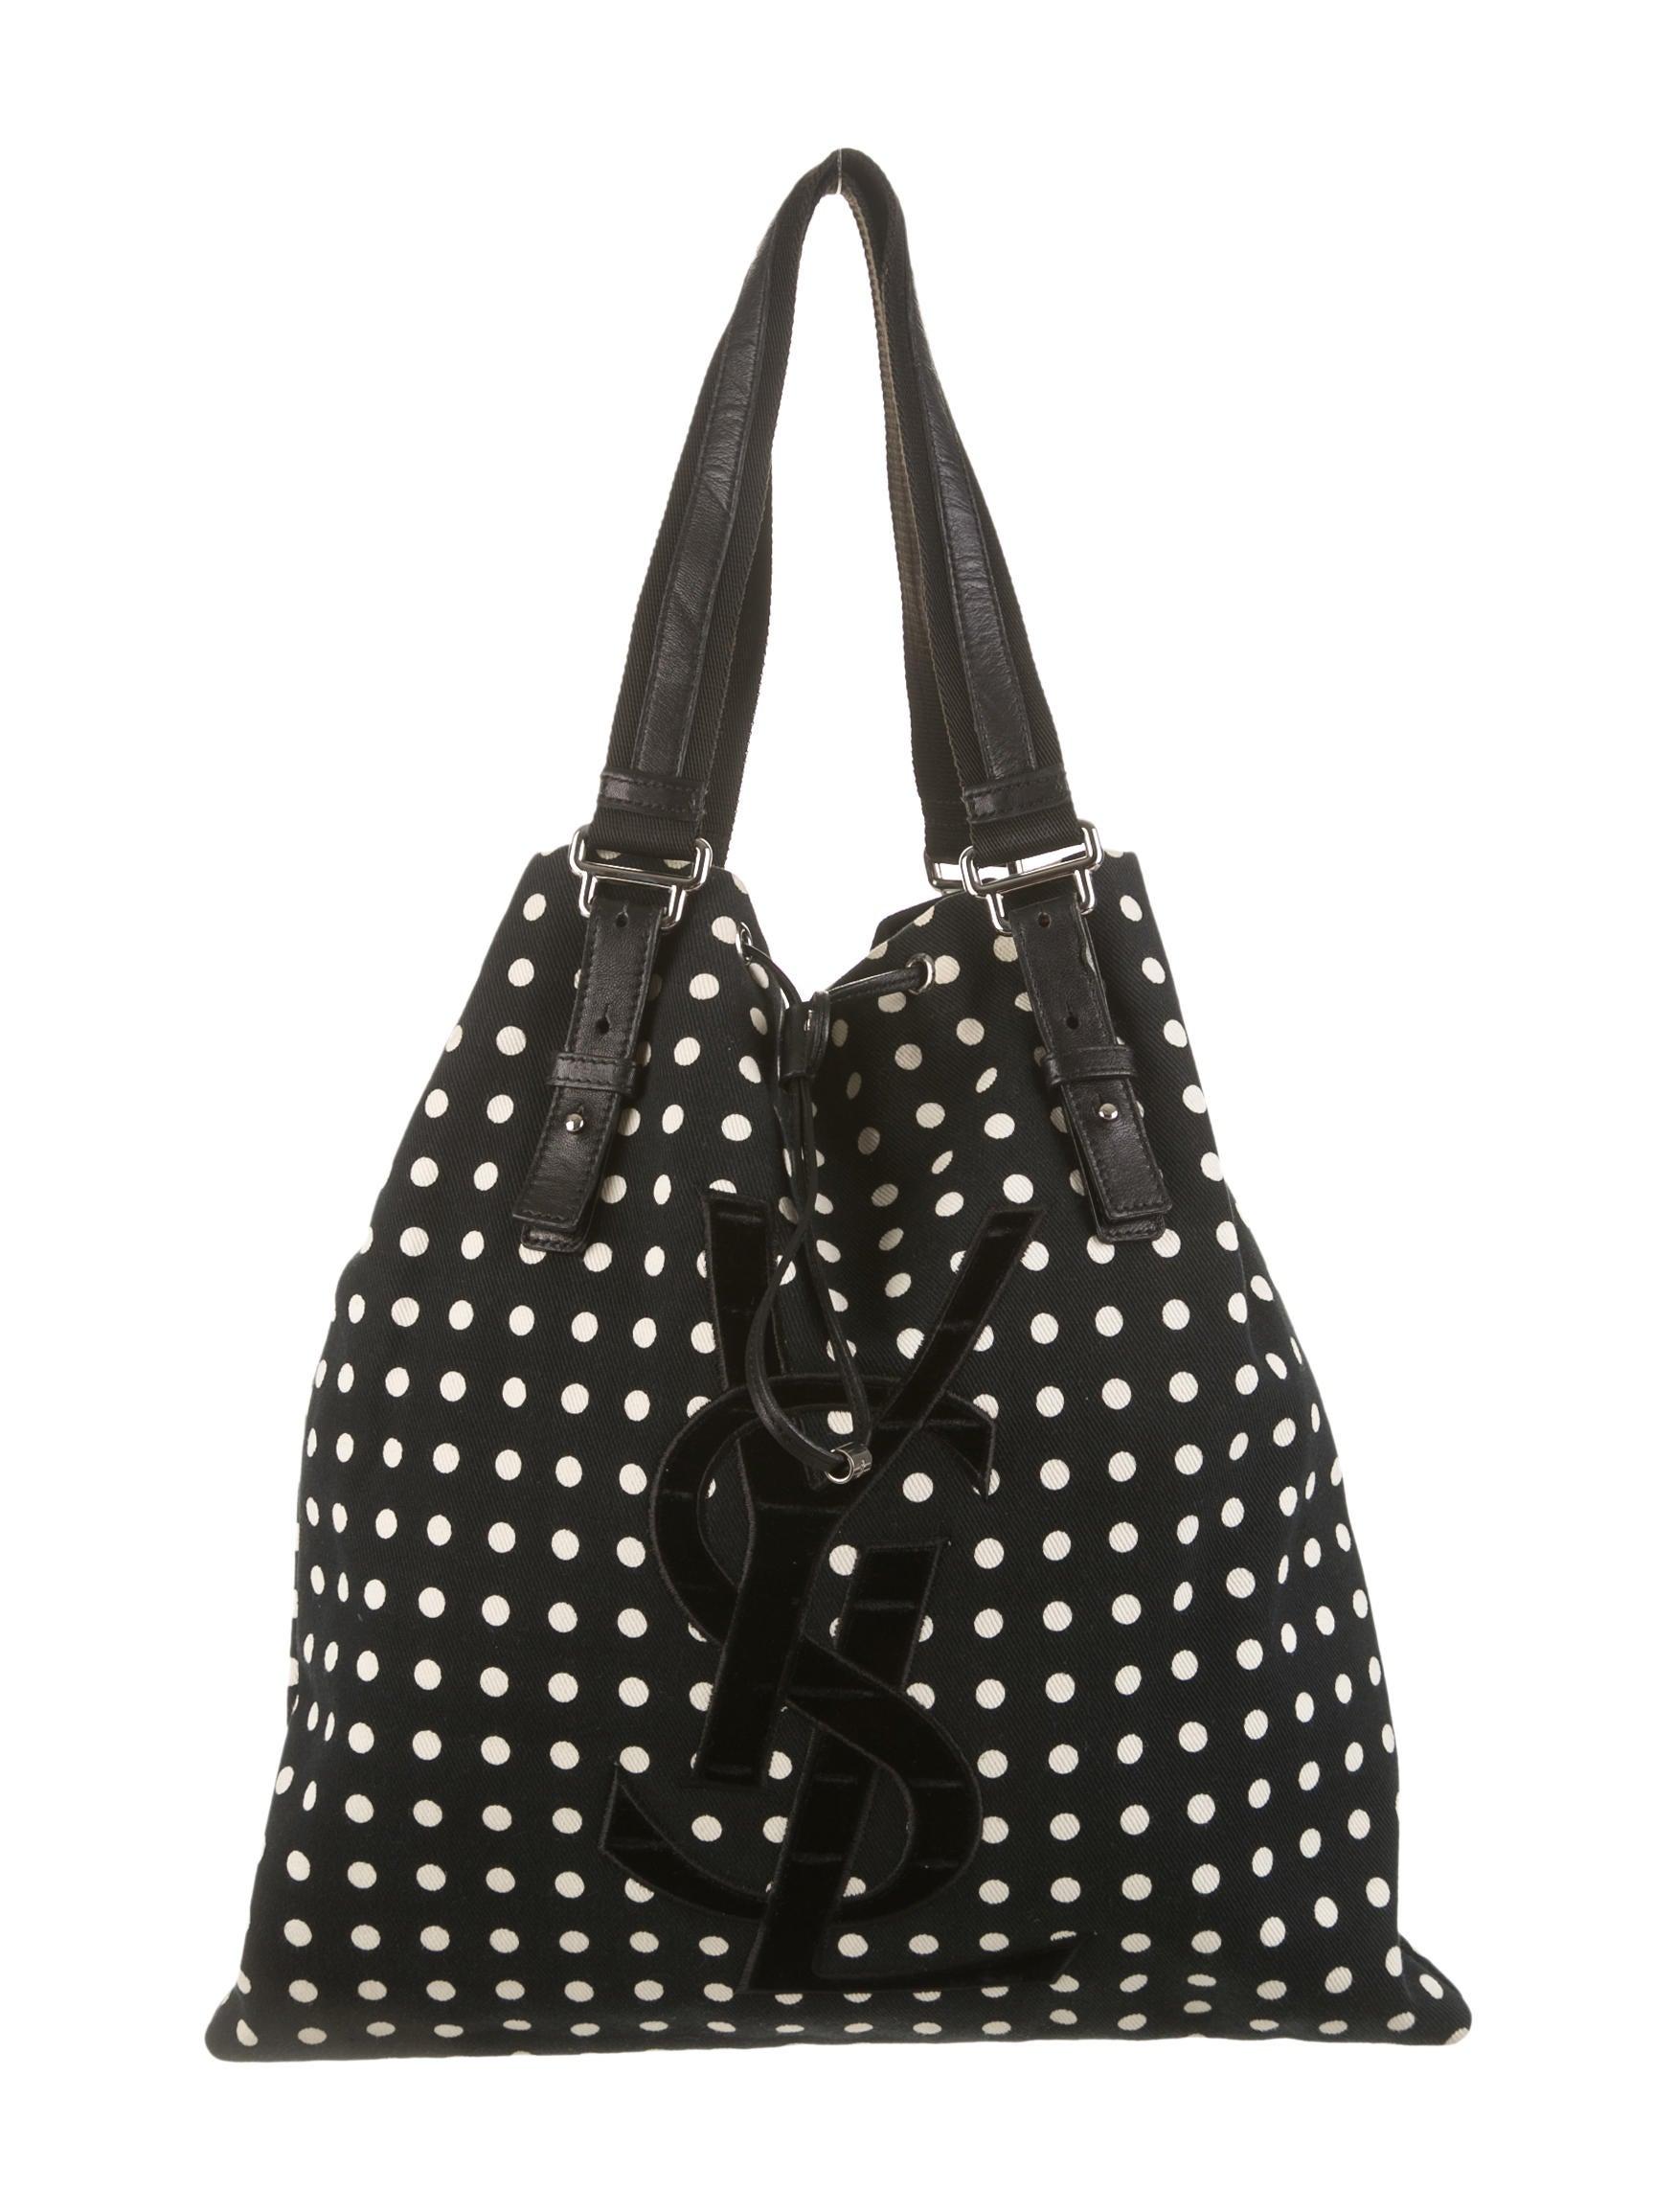 replica ysl bag - Yves Saint Laurent Tote - Handbags - YVE32910 | The RealReal